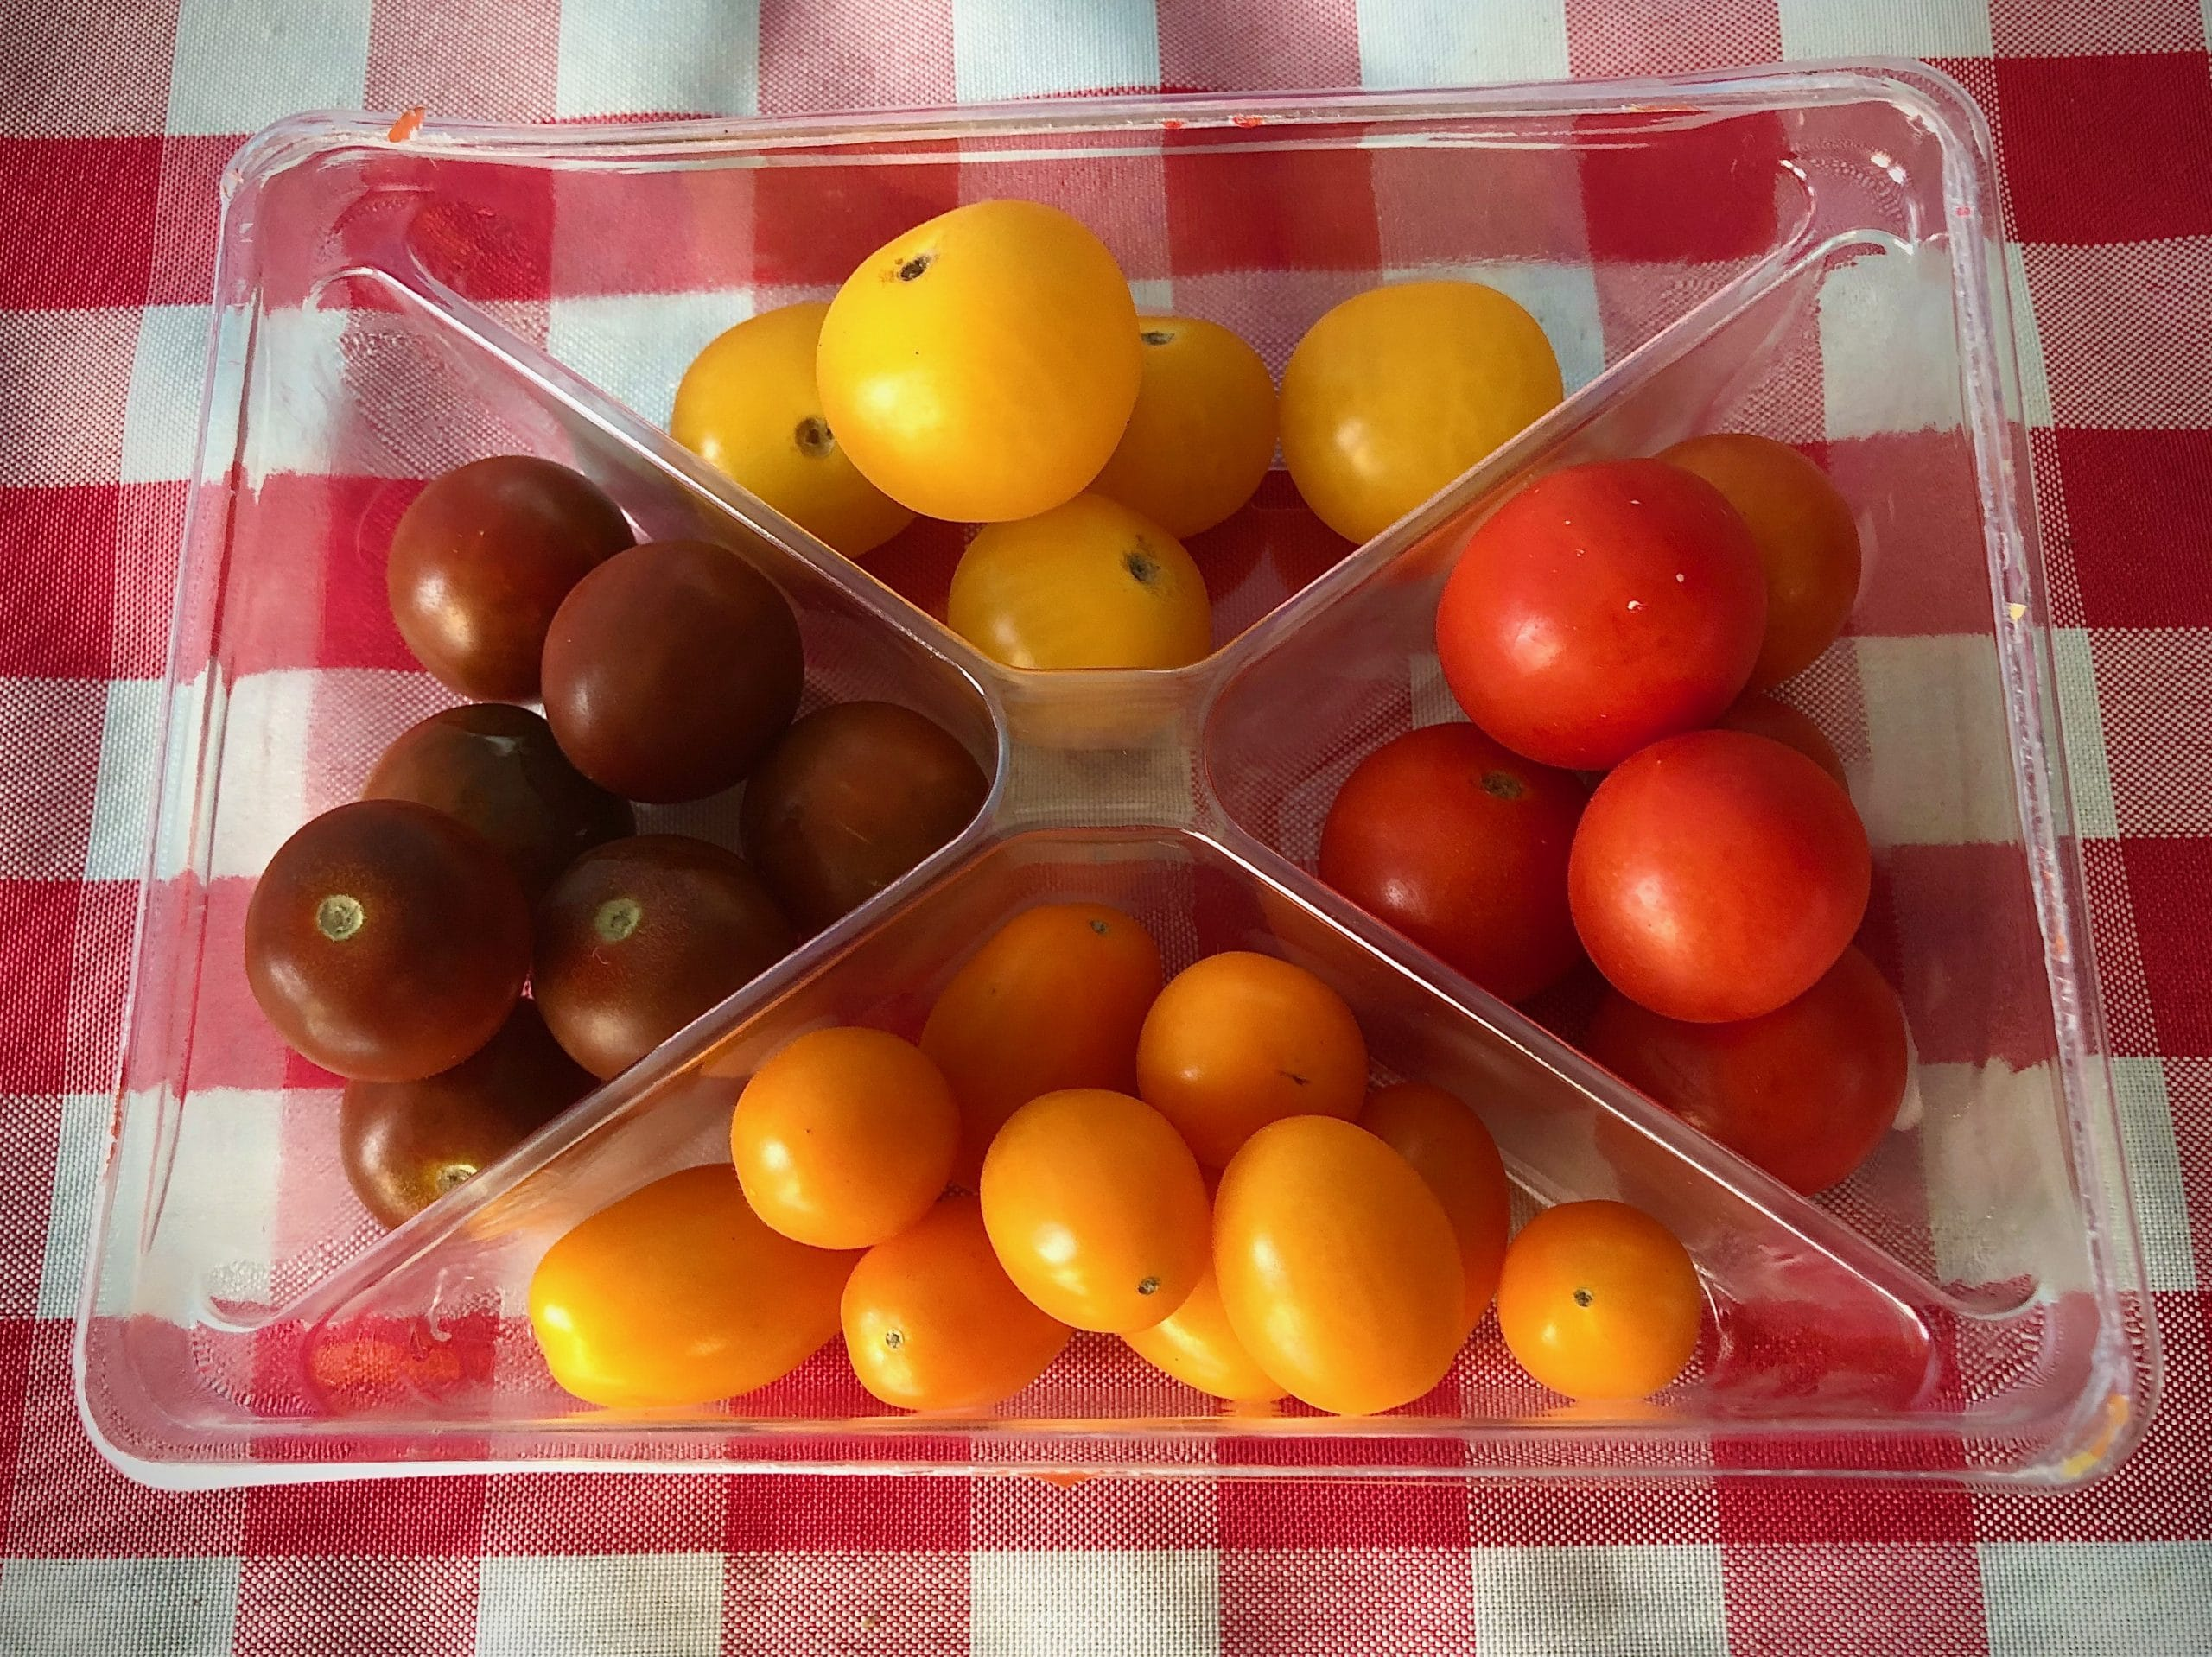 Kaleidos tomatoes